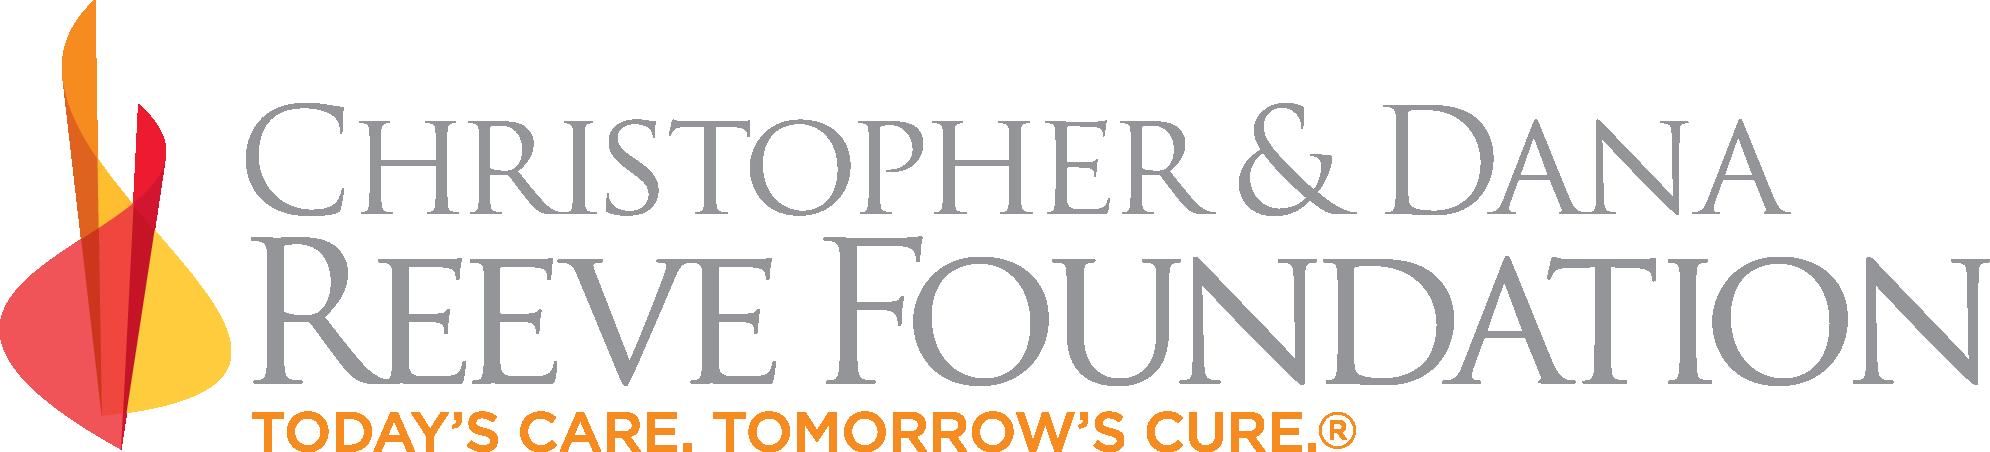 Christopher & Dana Reeve Foundation banner